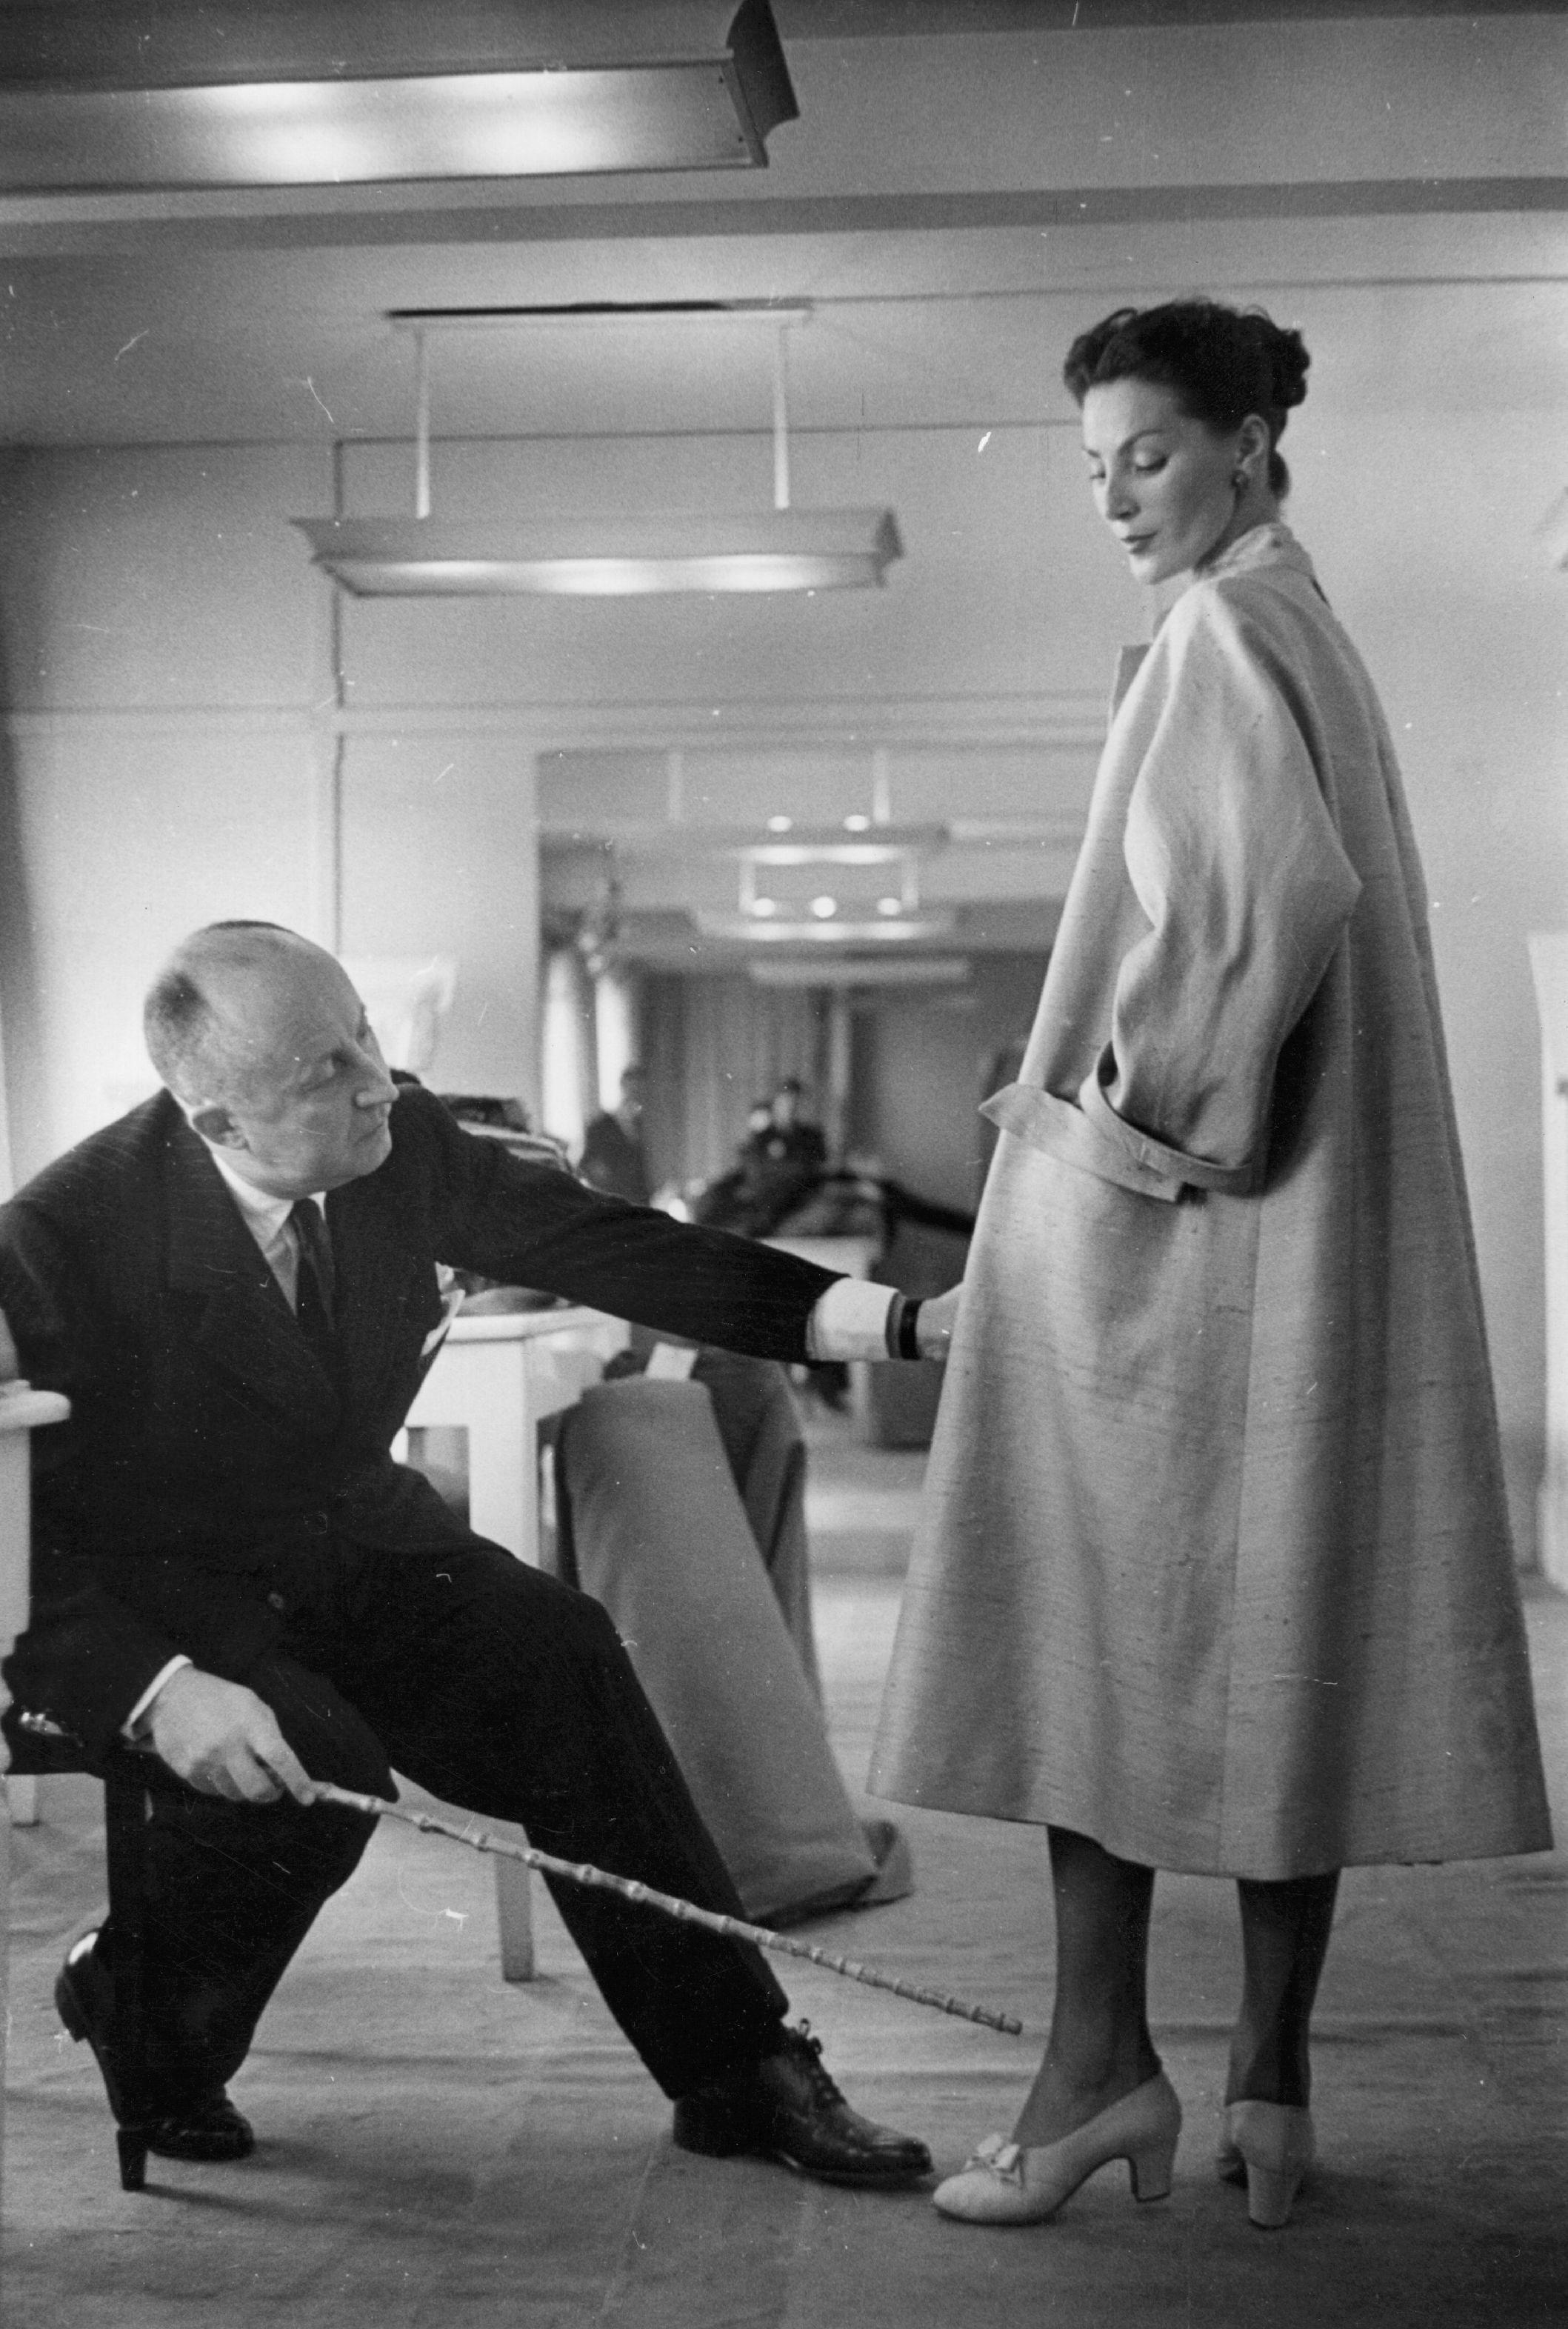 Christian Dior at work in his Paris studio  (1905-1957)   Source: Getty